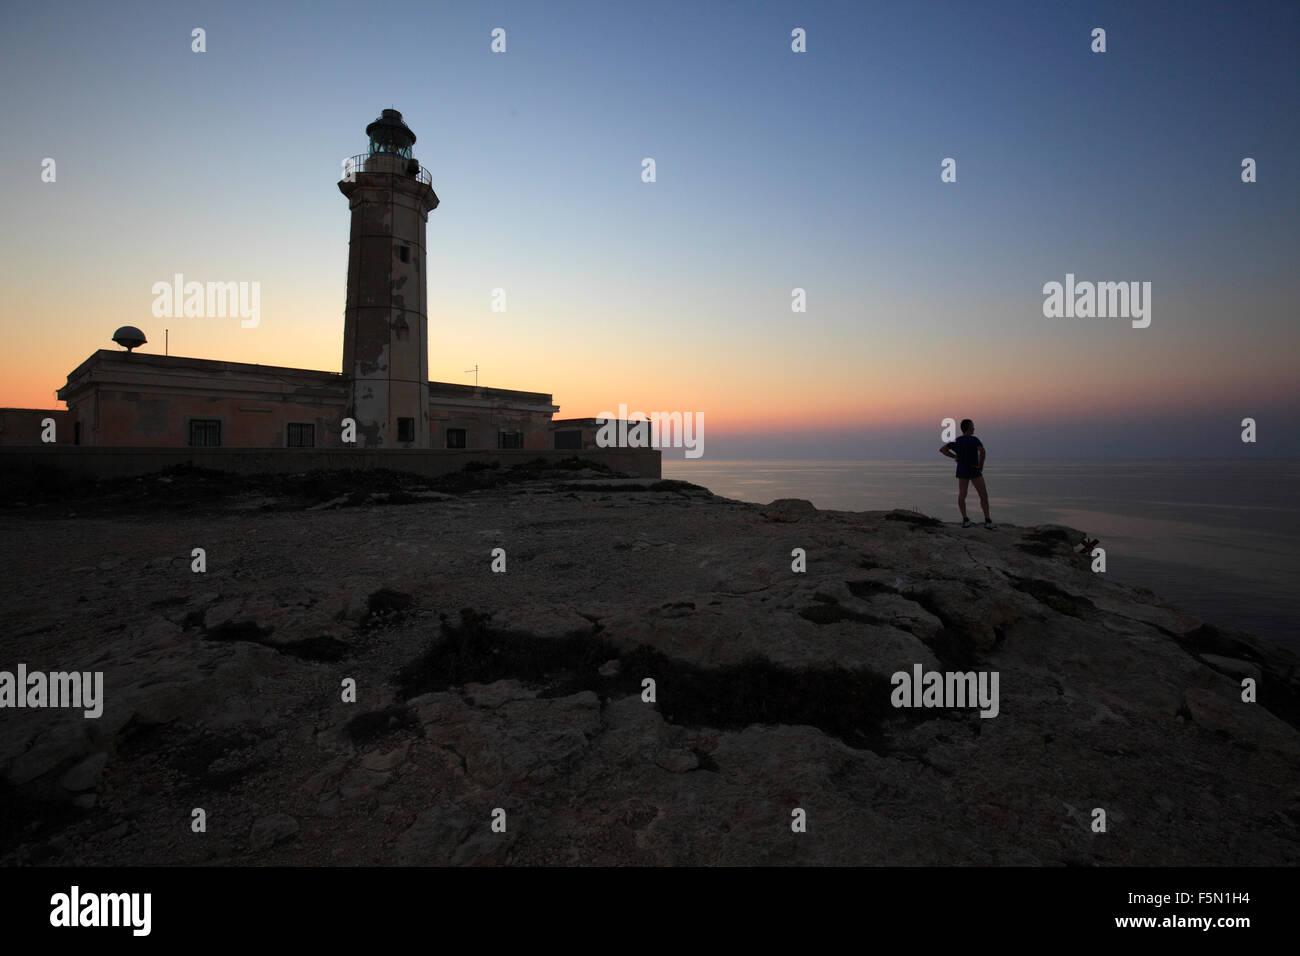 Lampedusa lighthouse at sunset, Sicily, Italy - Stock Image